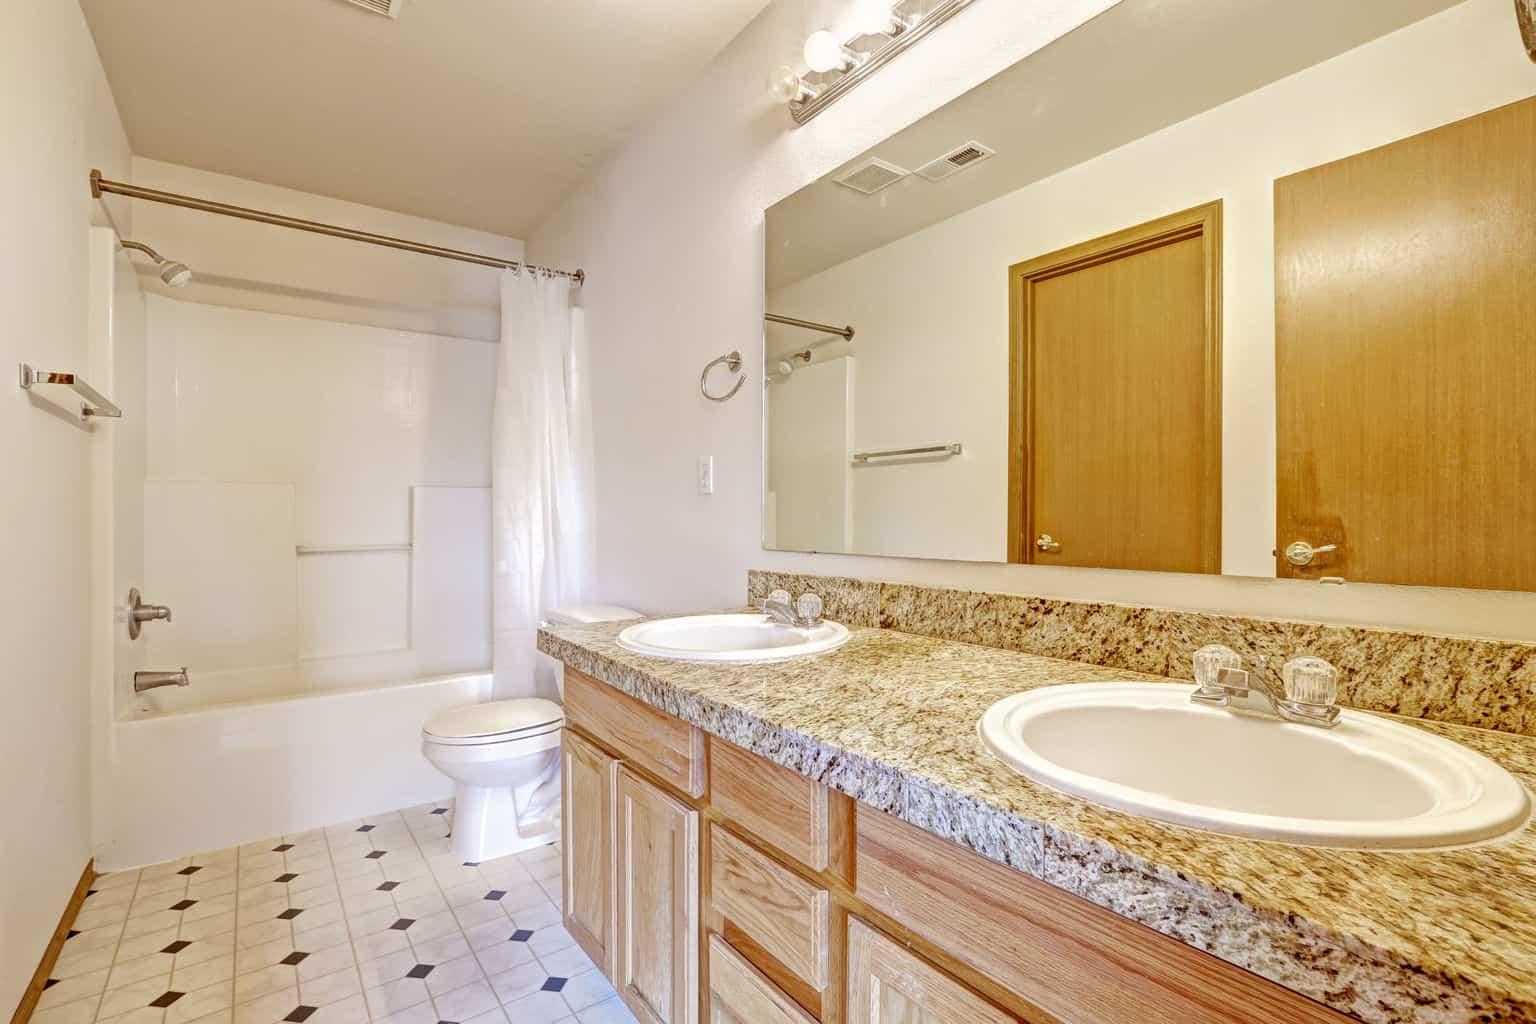 10 Cheap Flooring Ideas Best Home Flooring Ideas And Options